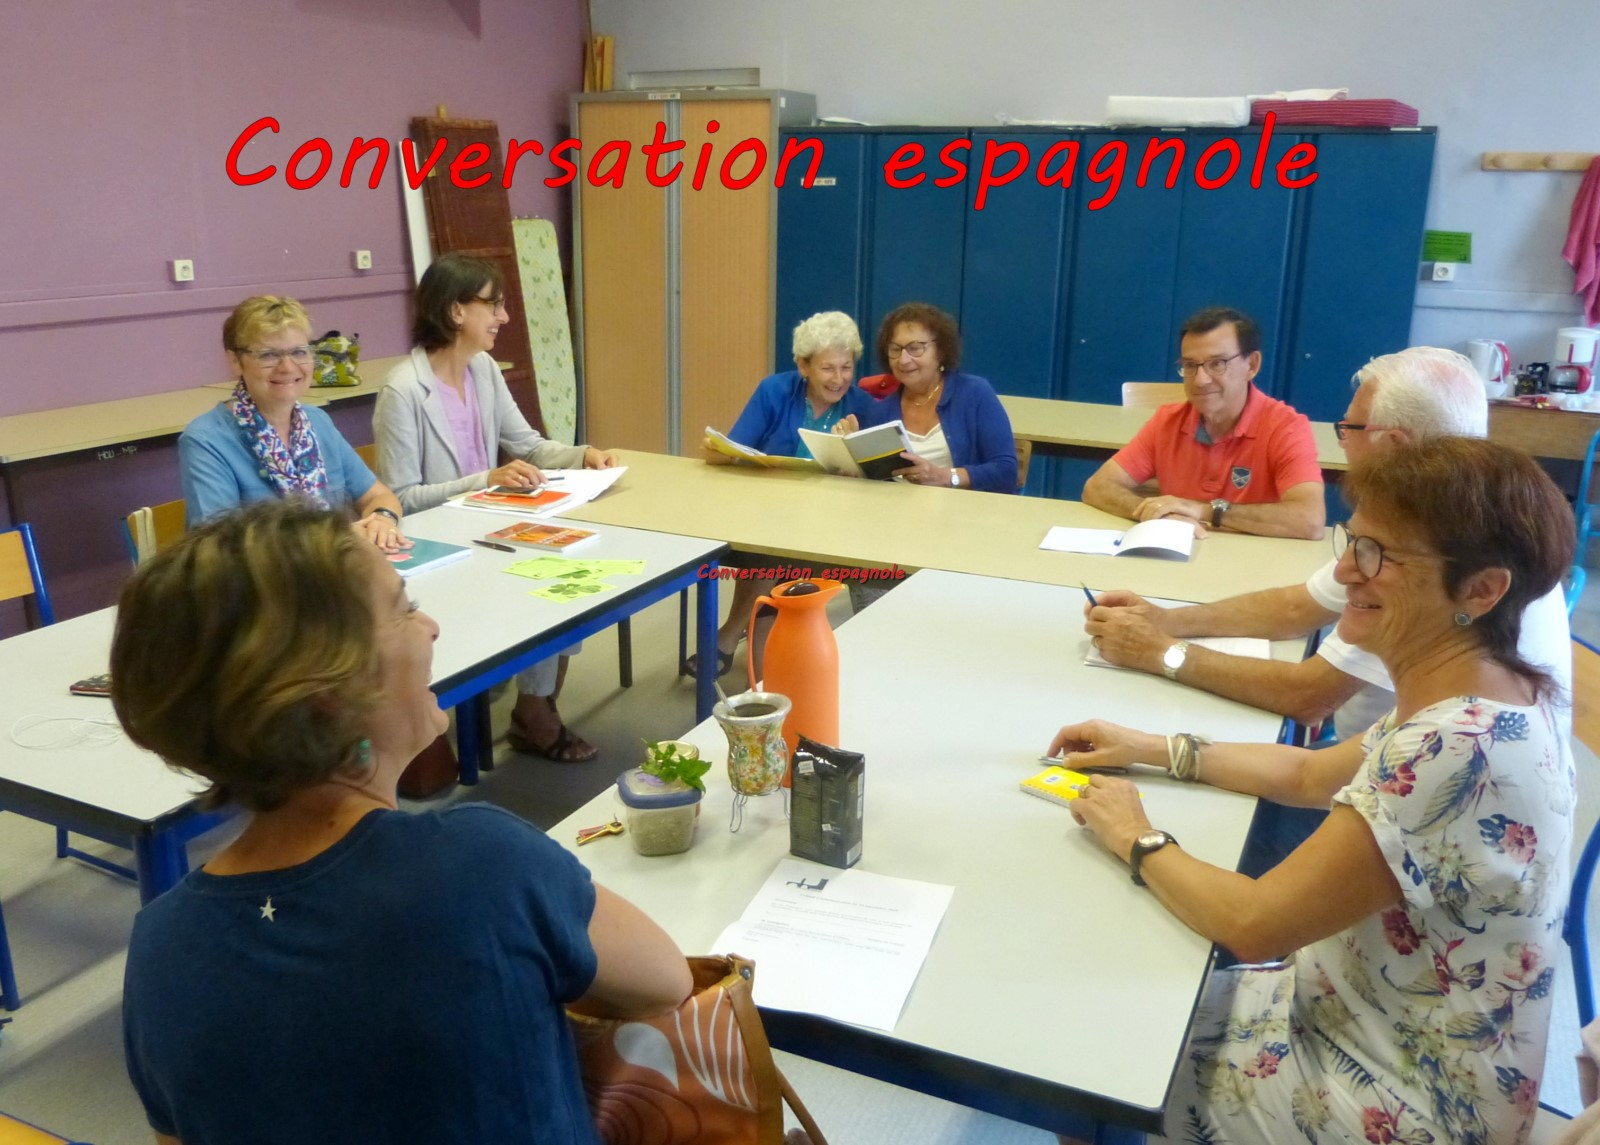 149Convers espagnole (3)